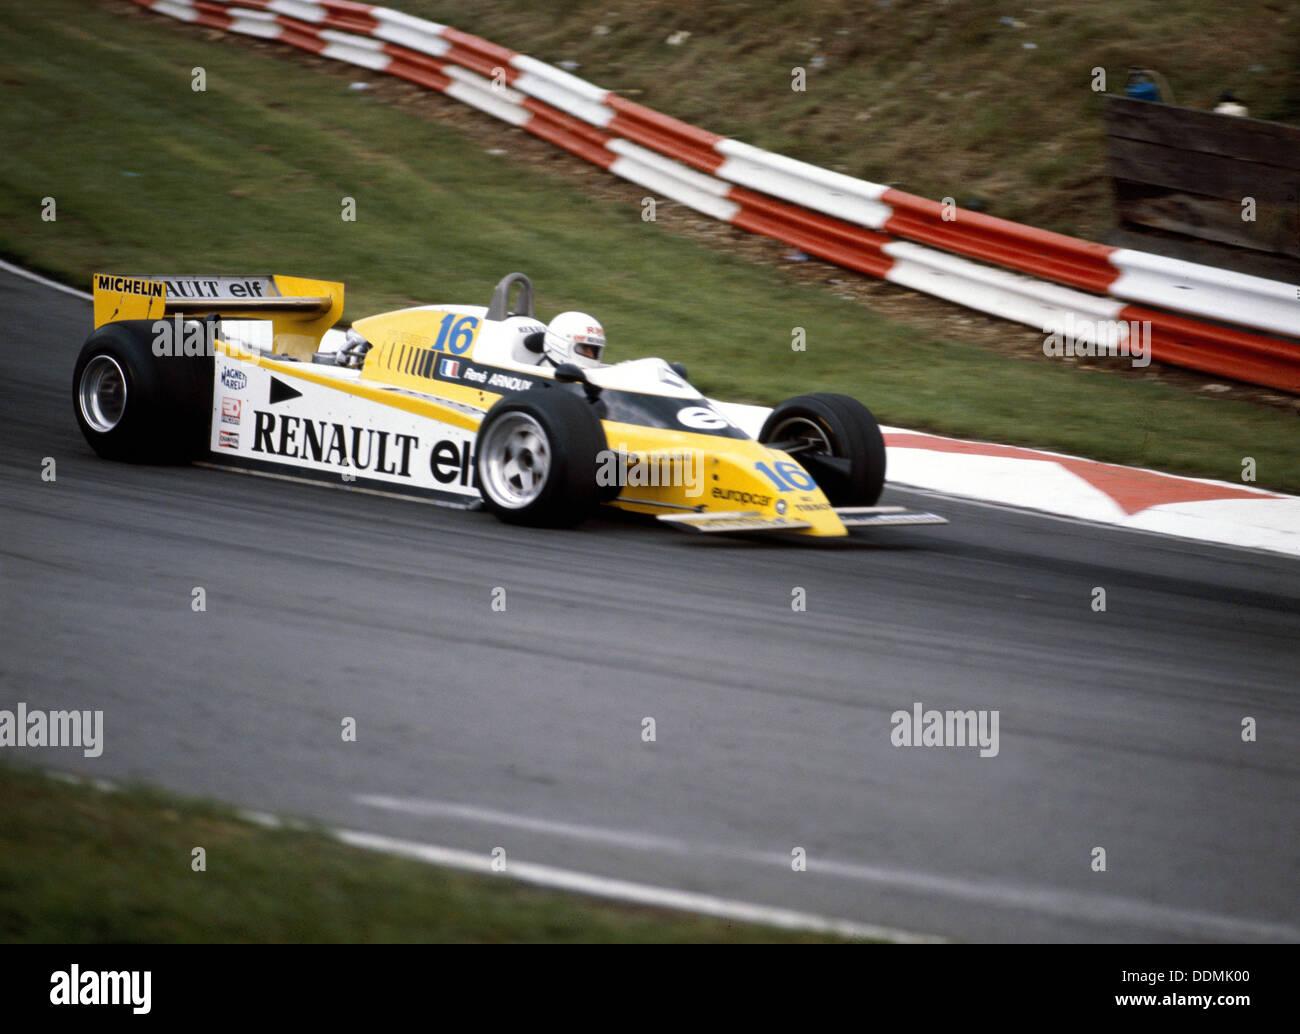 Rene Arnoux racing a Renault RE20, British Grand Prix, Brands Hatch, 1980. - Stock Image